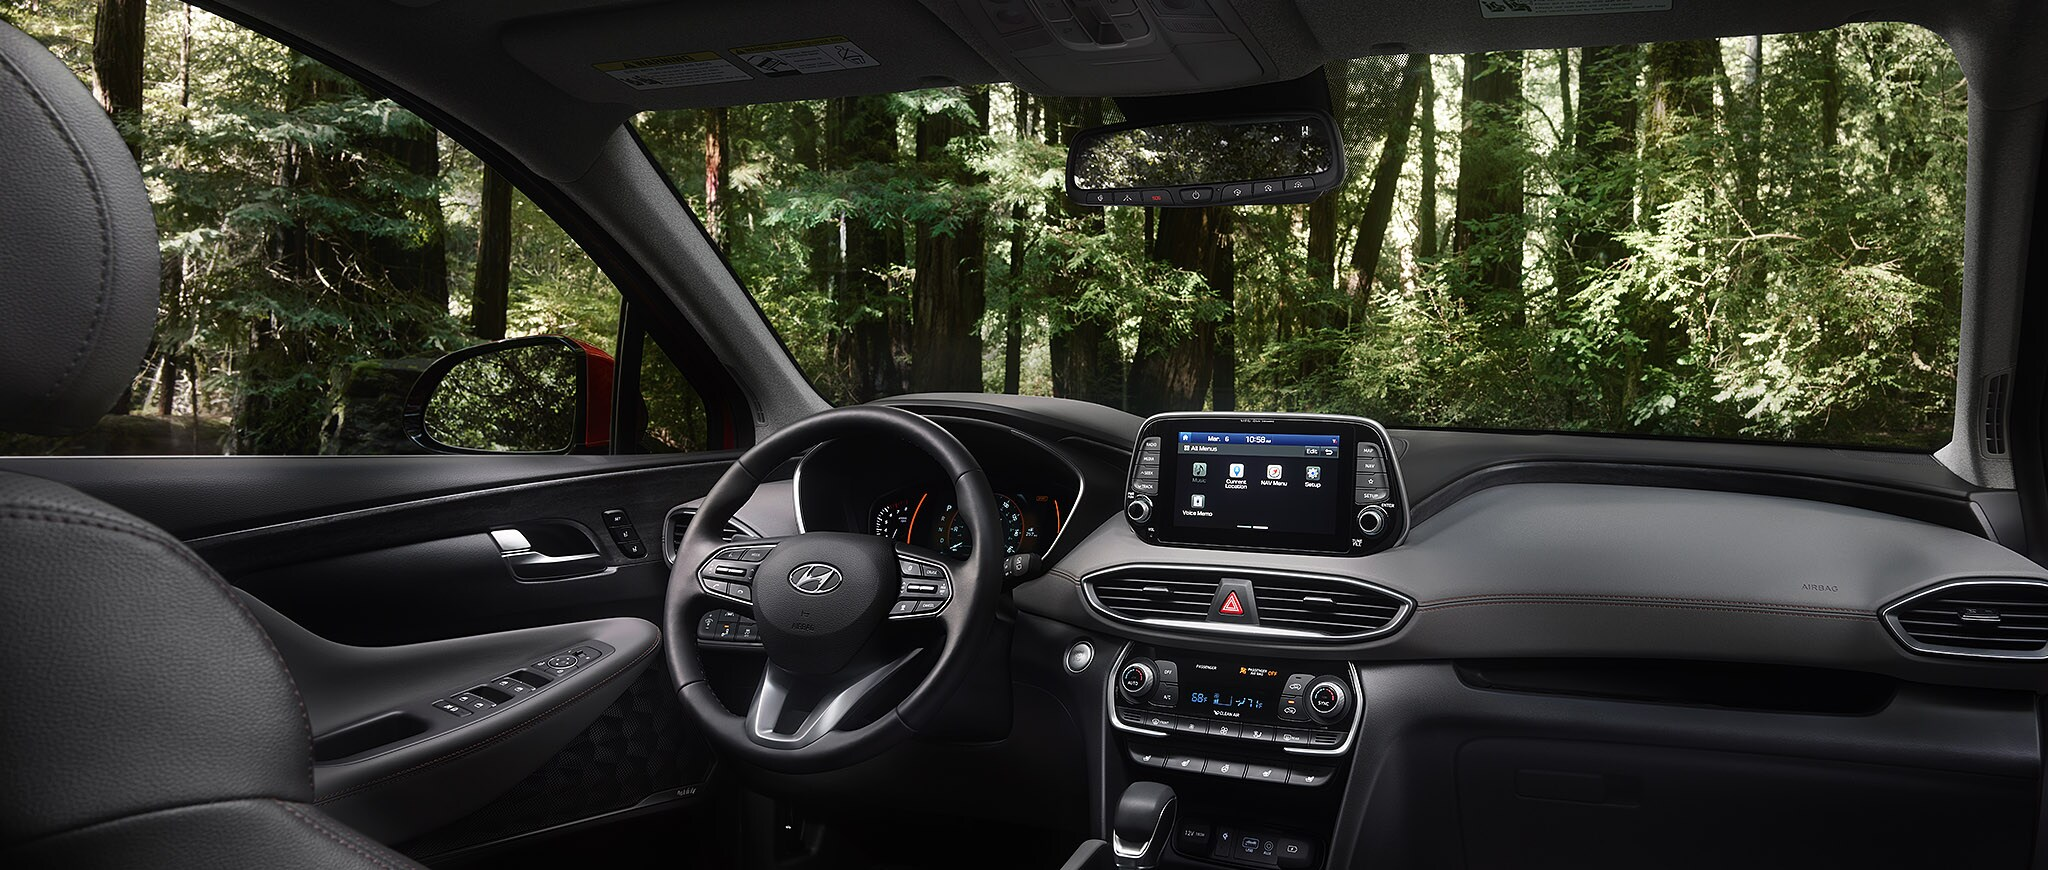 Hyundai Santa Fe Ranked #1 Among Popular Mid-size SUVs by Cars.com